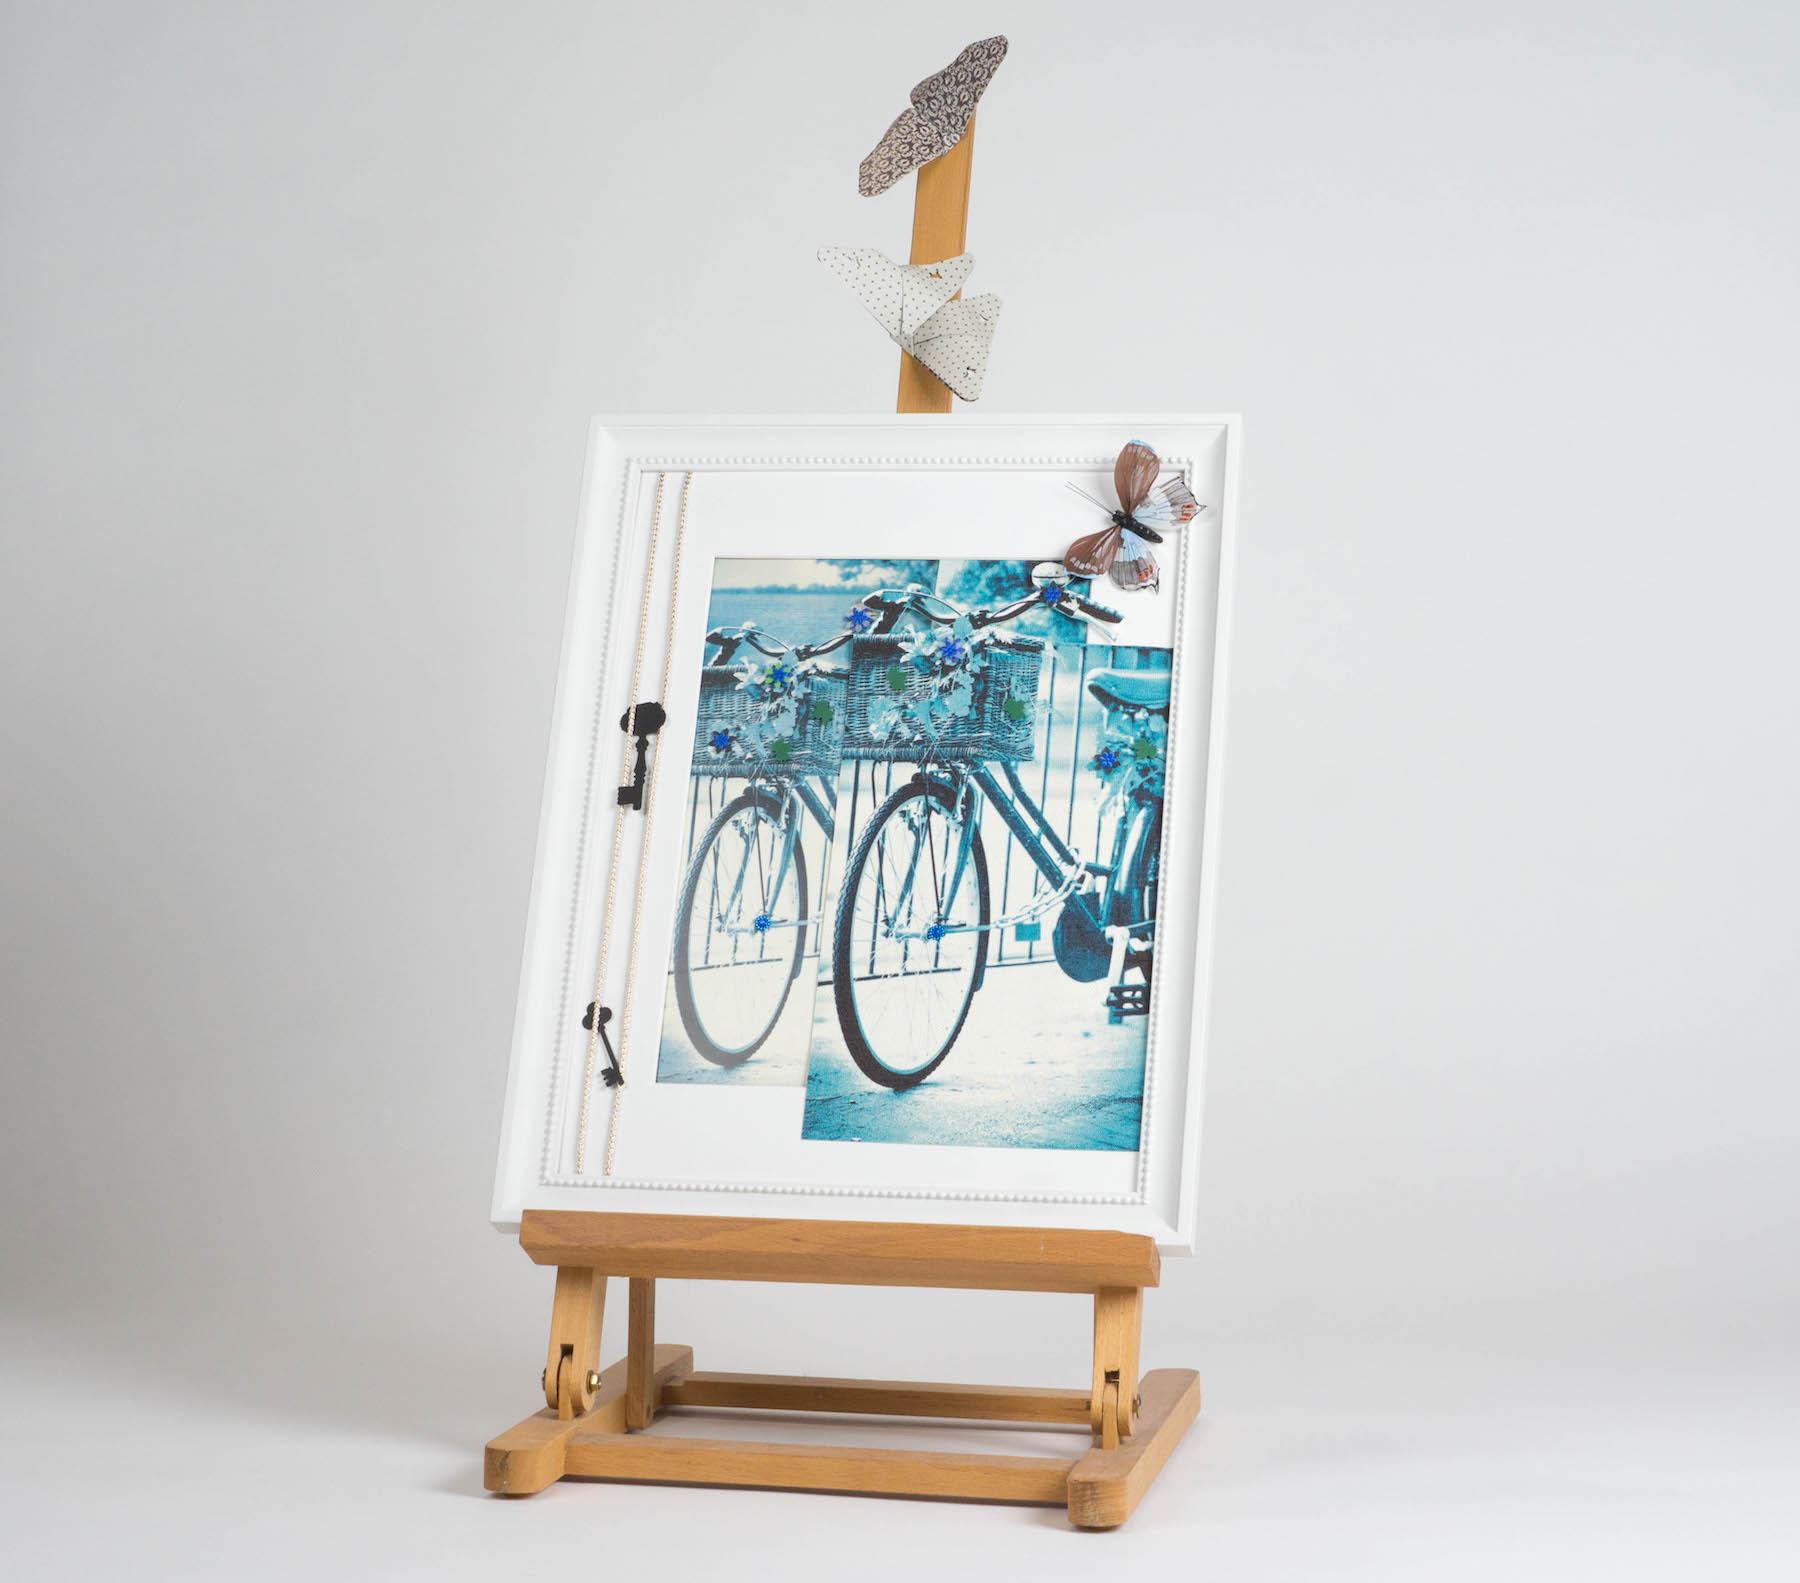 Großzügig 12 öffnungsrahmen Collage Bilder - Rahmen Ideen ...